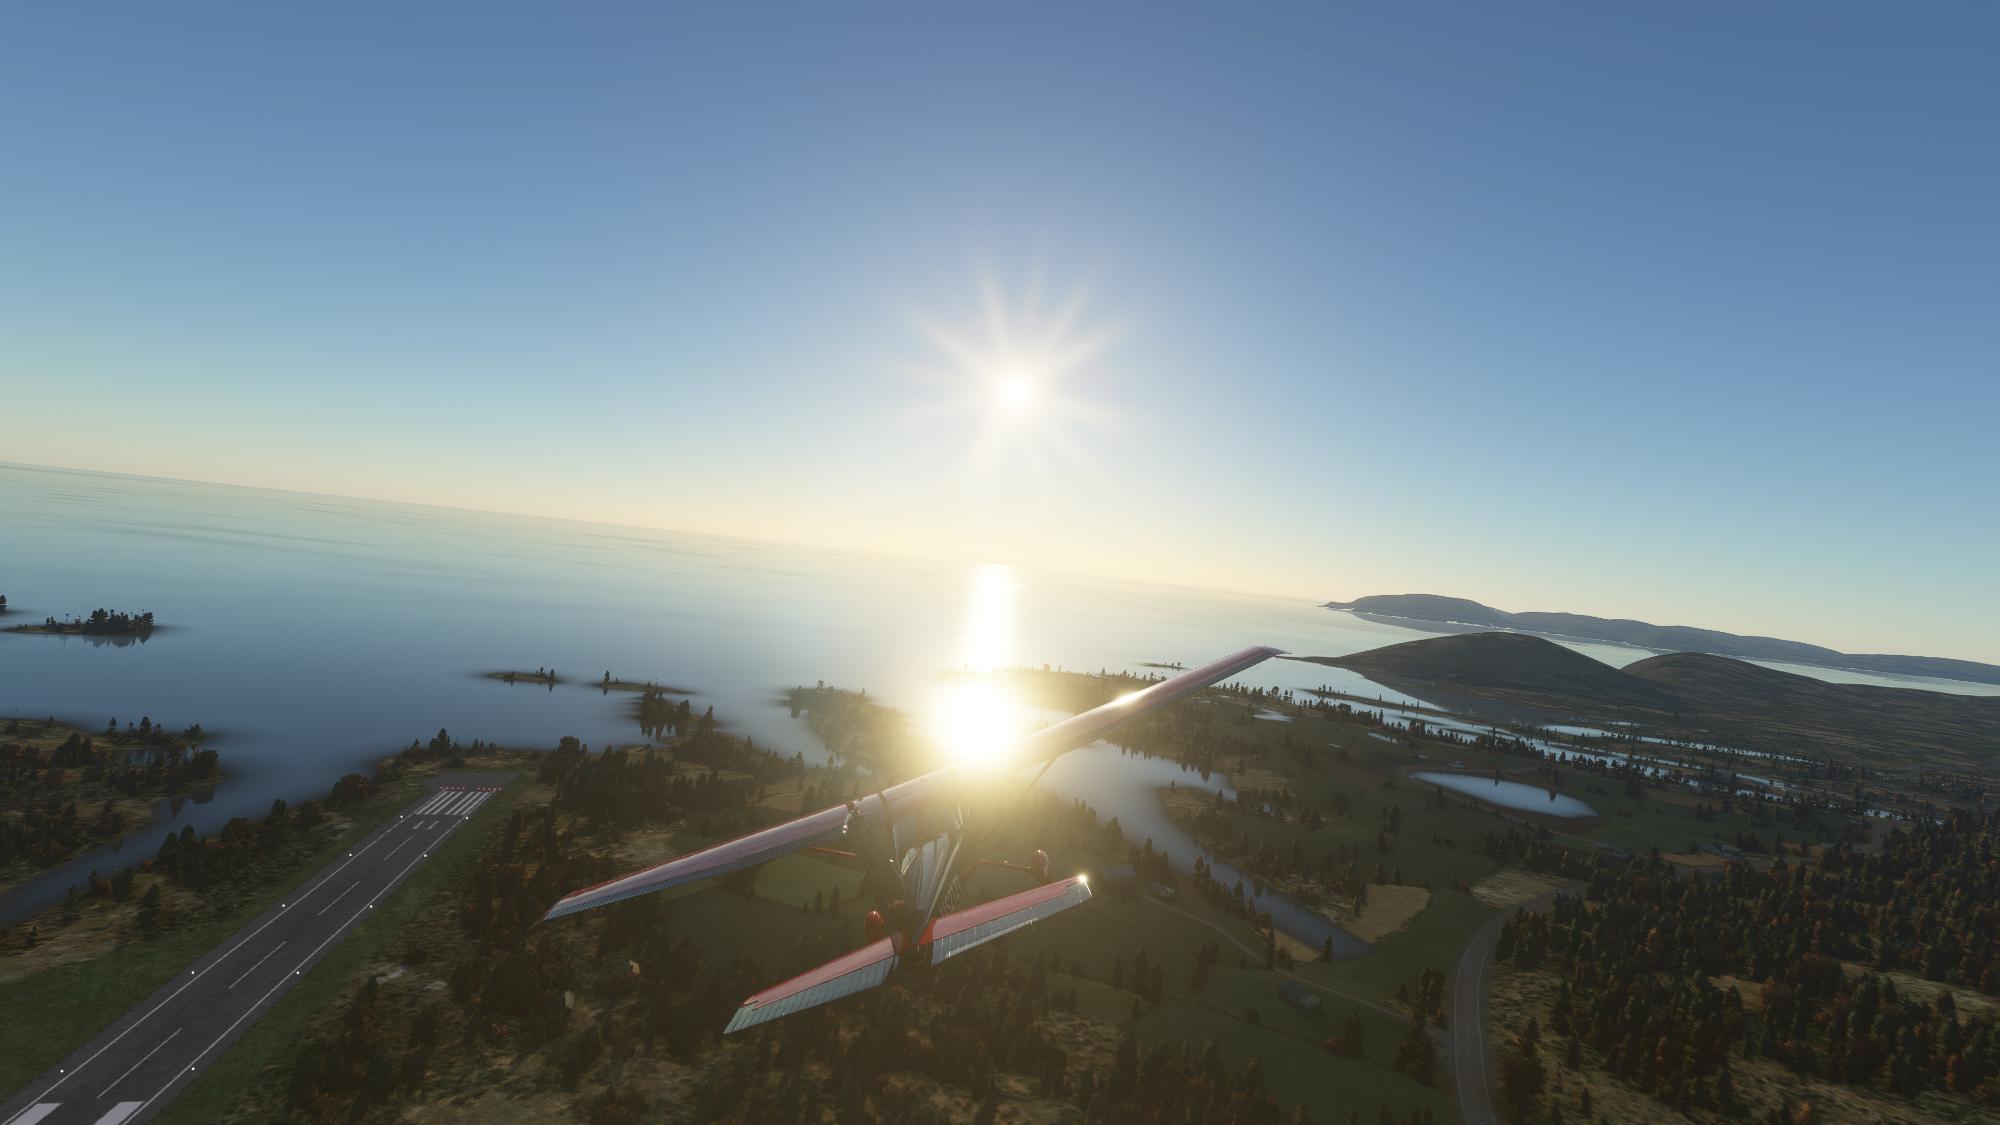 Microsoft Flight Simulator - 1.10.11.0 21.11.2020 20_46_19.png